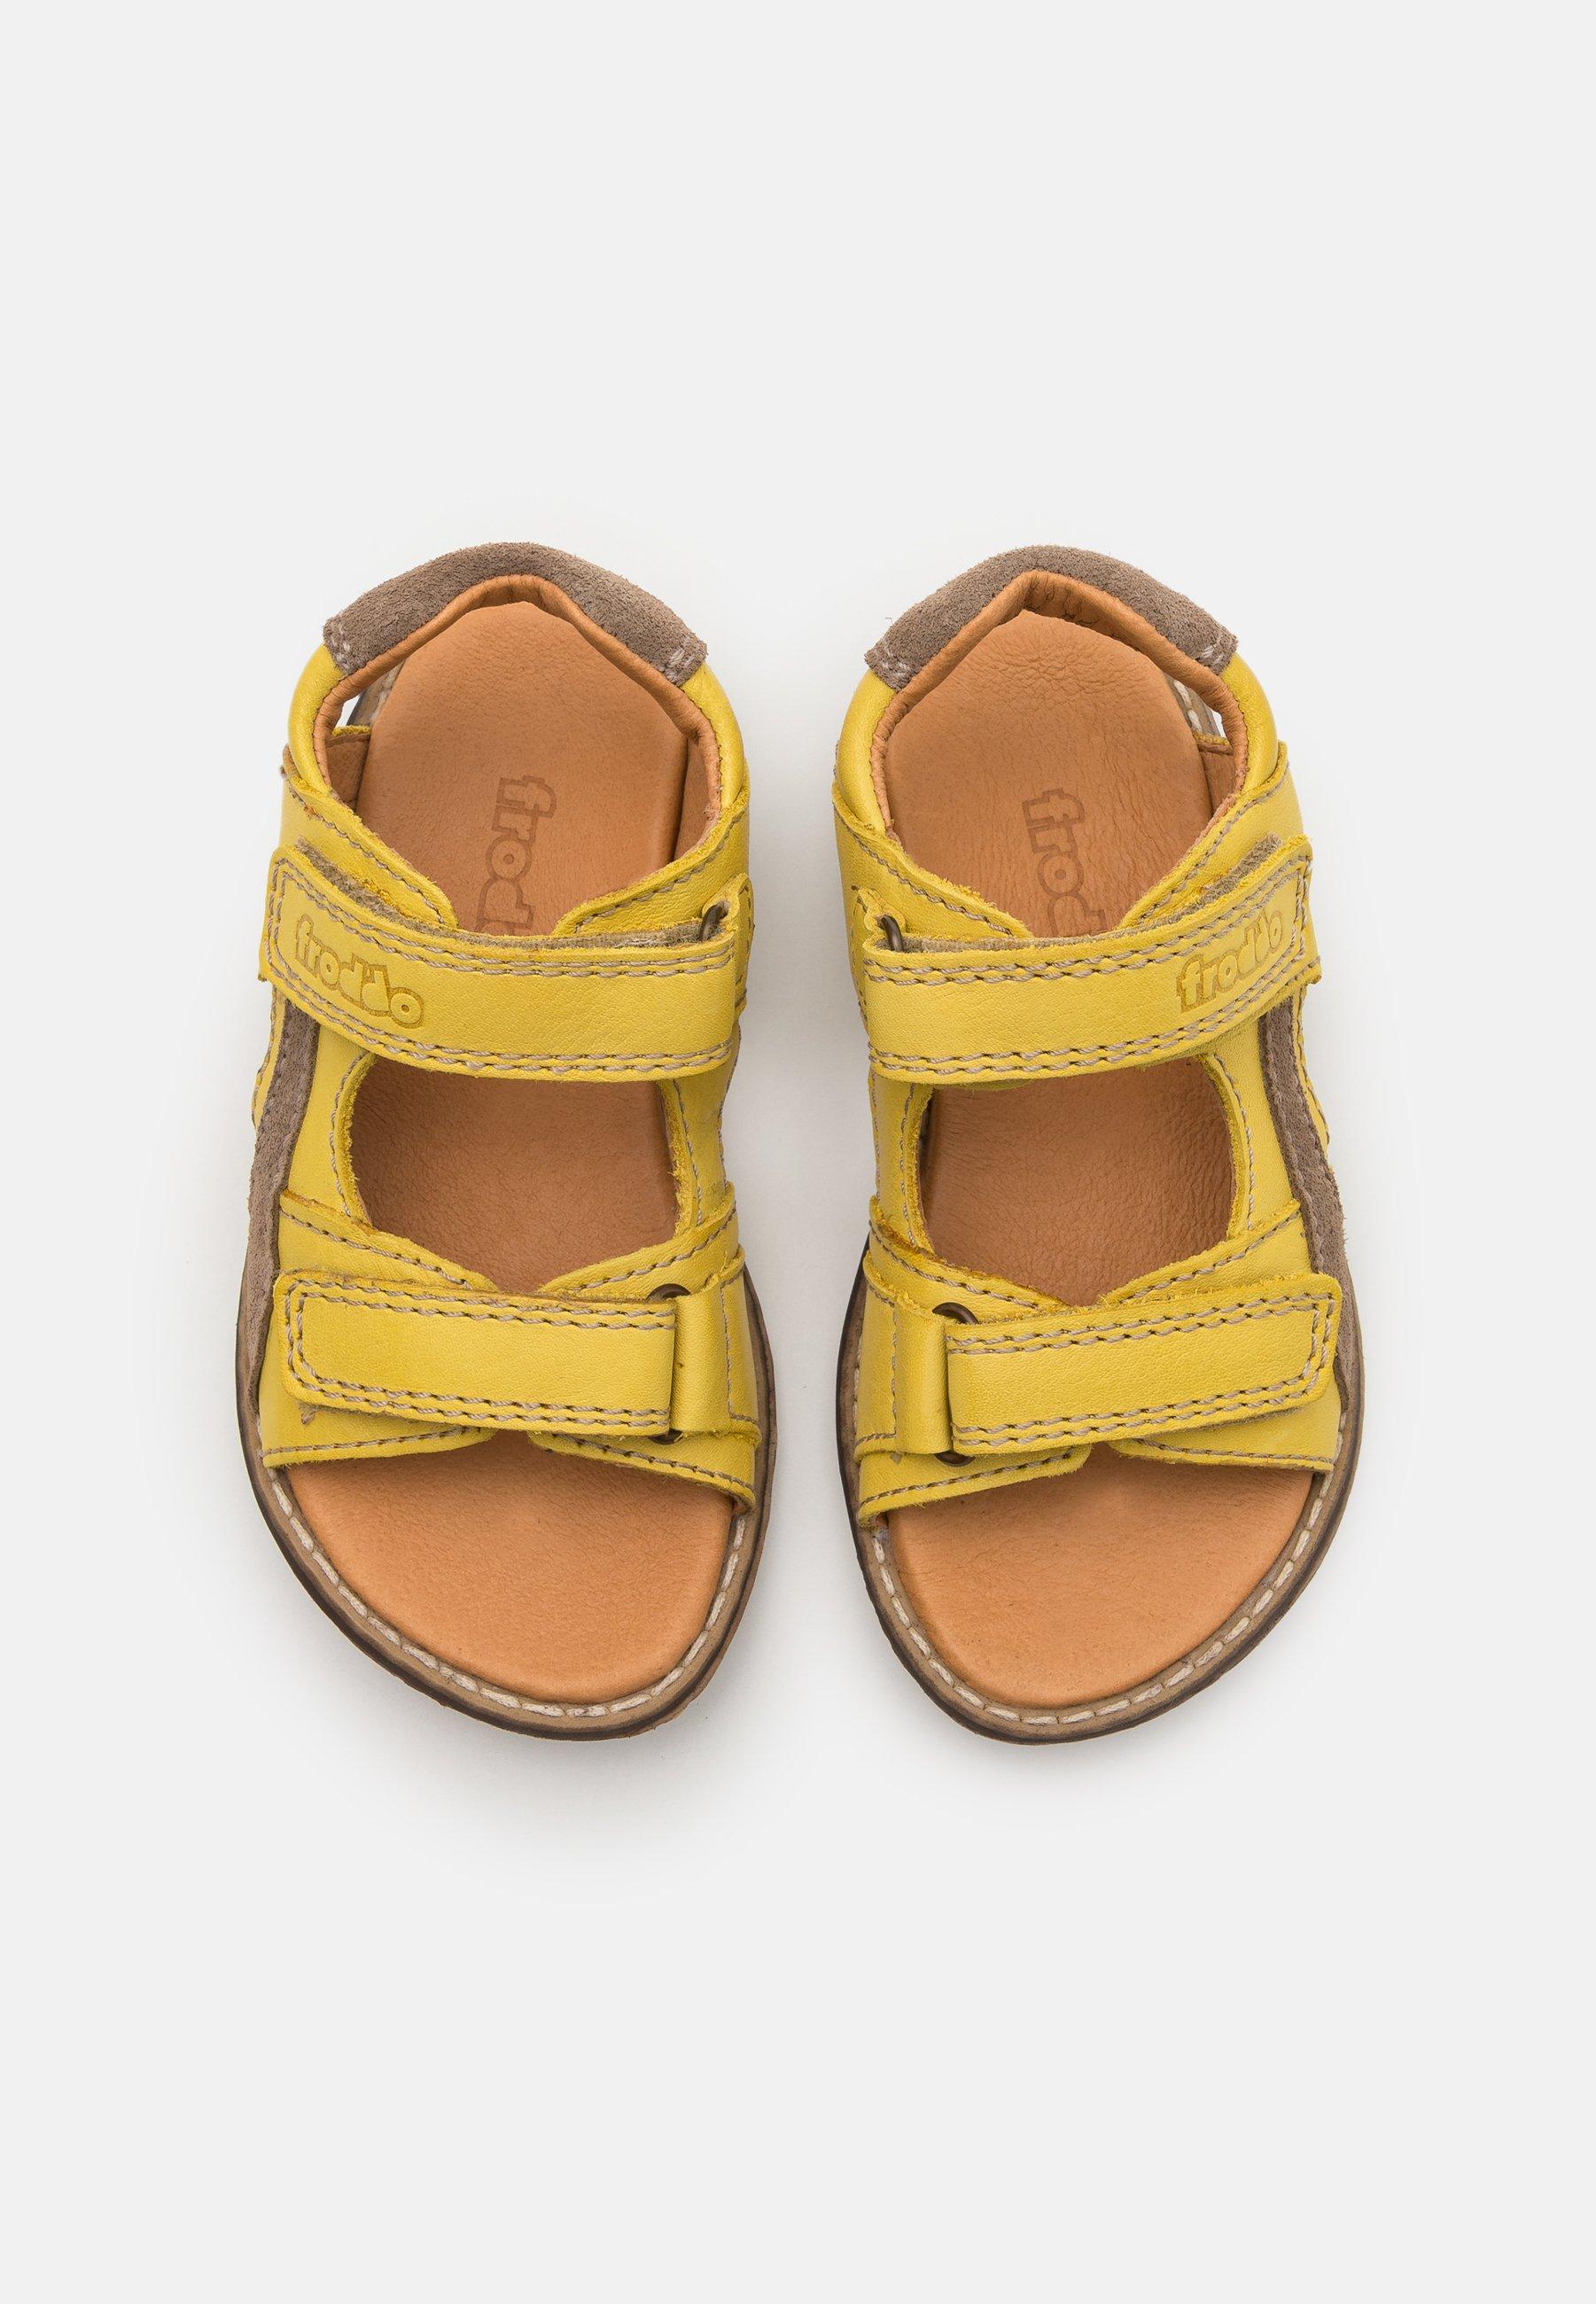 Enfant DAROS DOUBLE UNISEX - Sandales